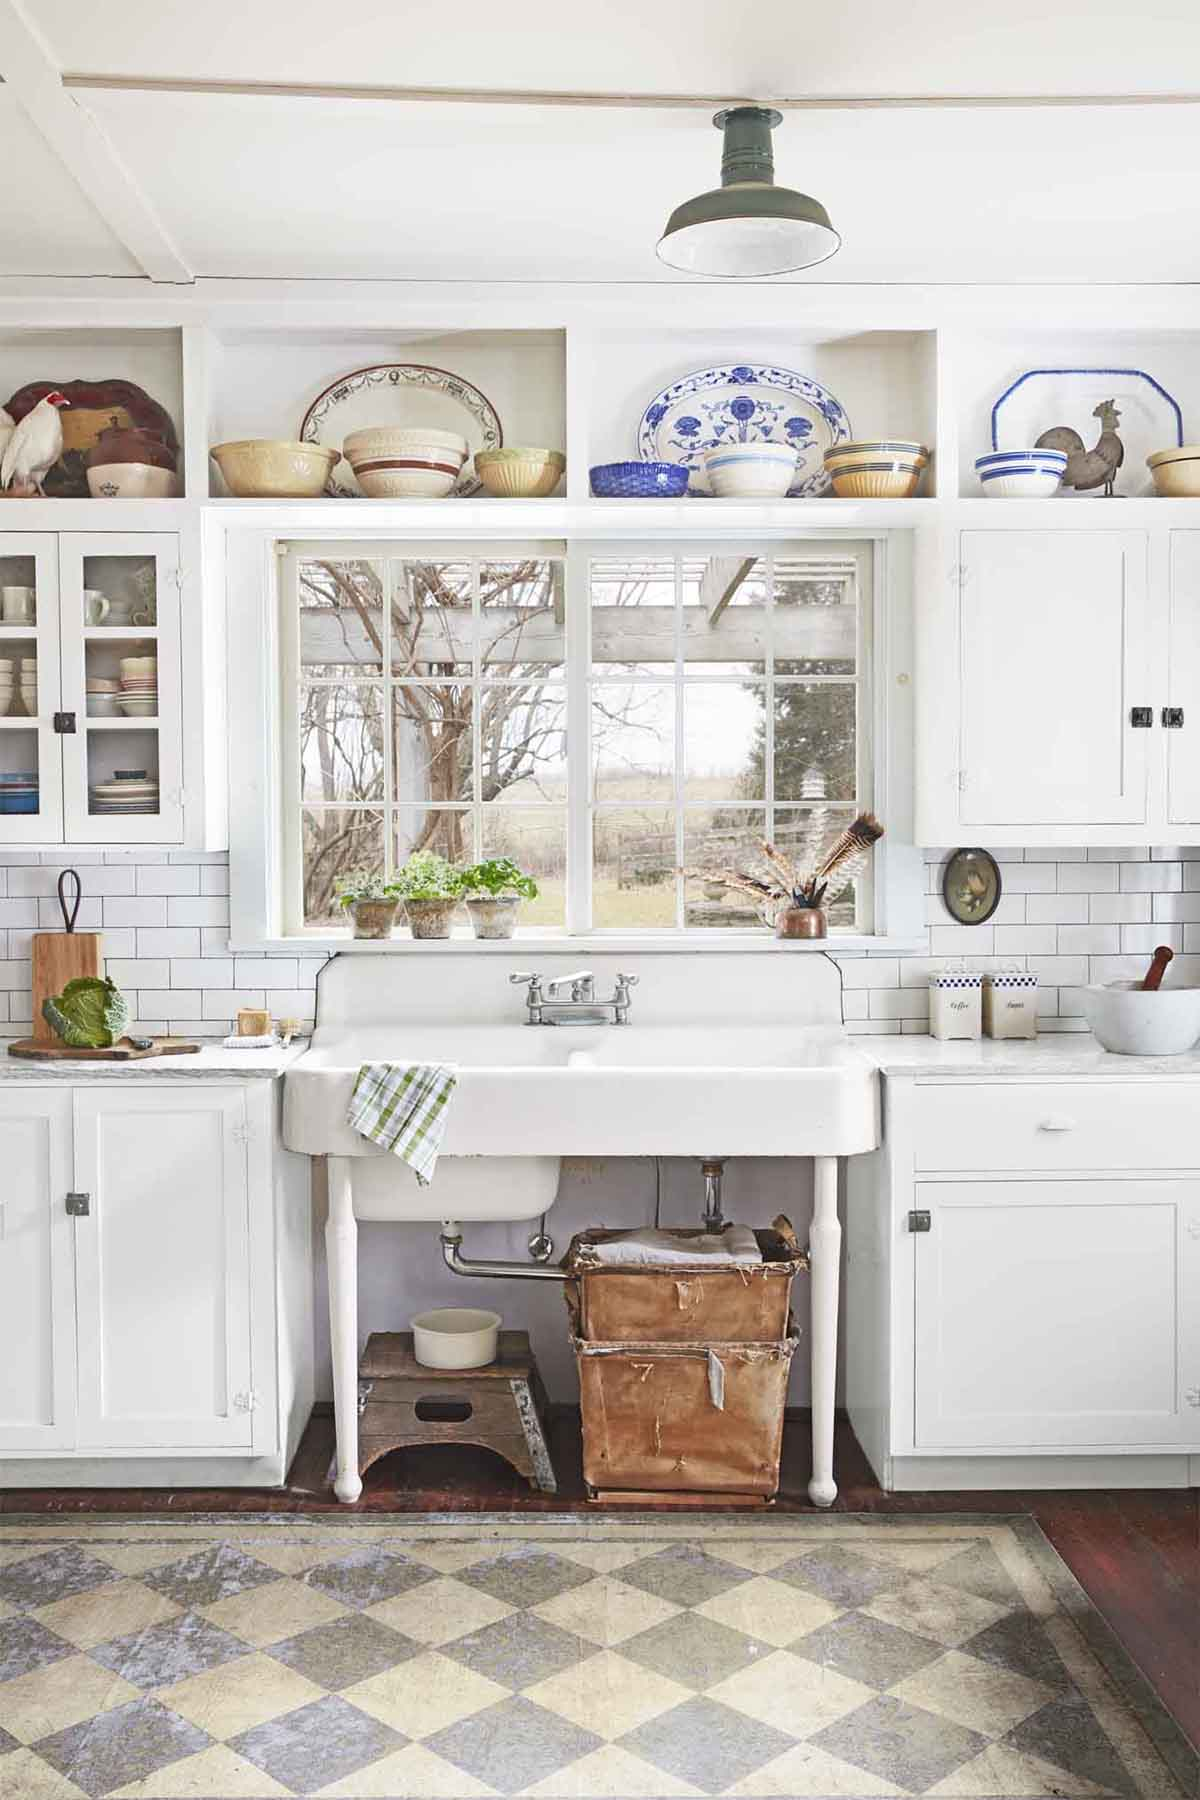 Una cucina stile vintage date un 39 occhiata a queste 20 bellissime idee - Cucina stile vintage ...